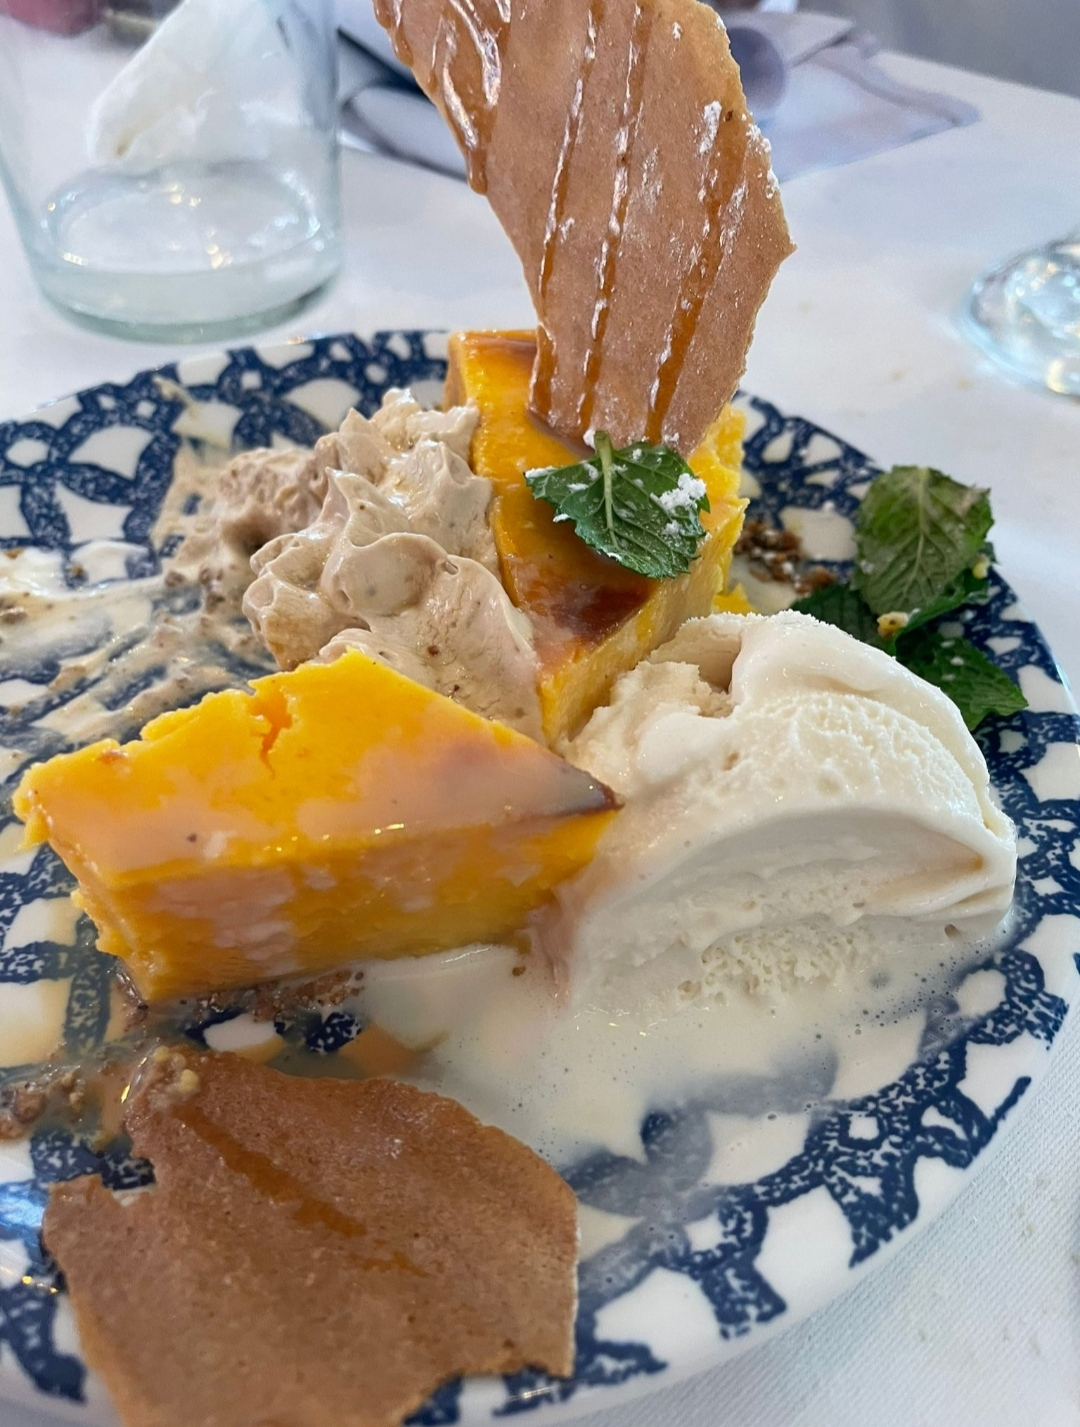 Reseñas gastronómicas: Restaurante Bon Vent 6